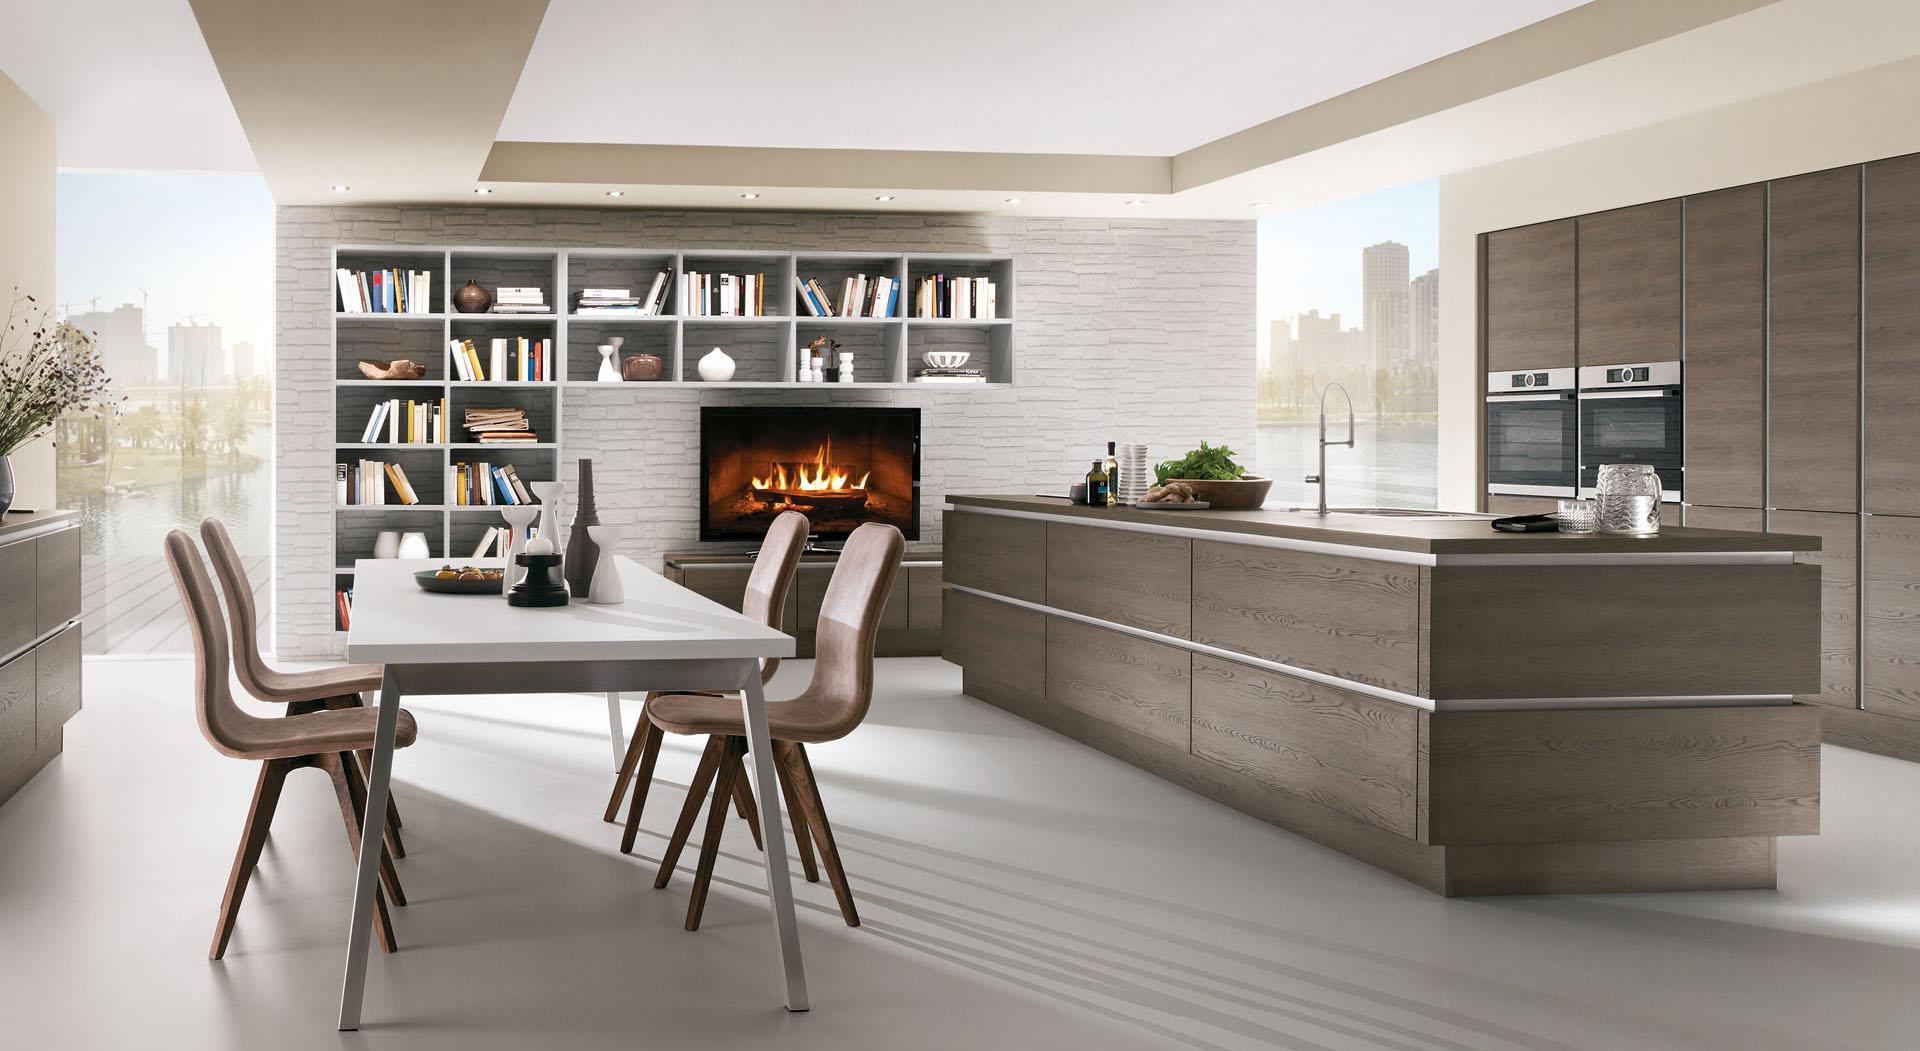 Cuisine melun eco cuisine melun 77 votre cuisine tout compris - Model keuken ...